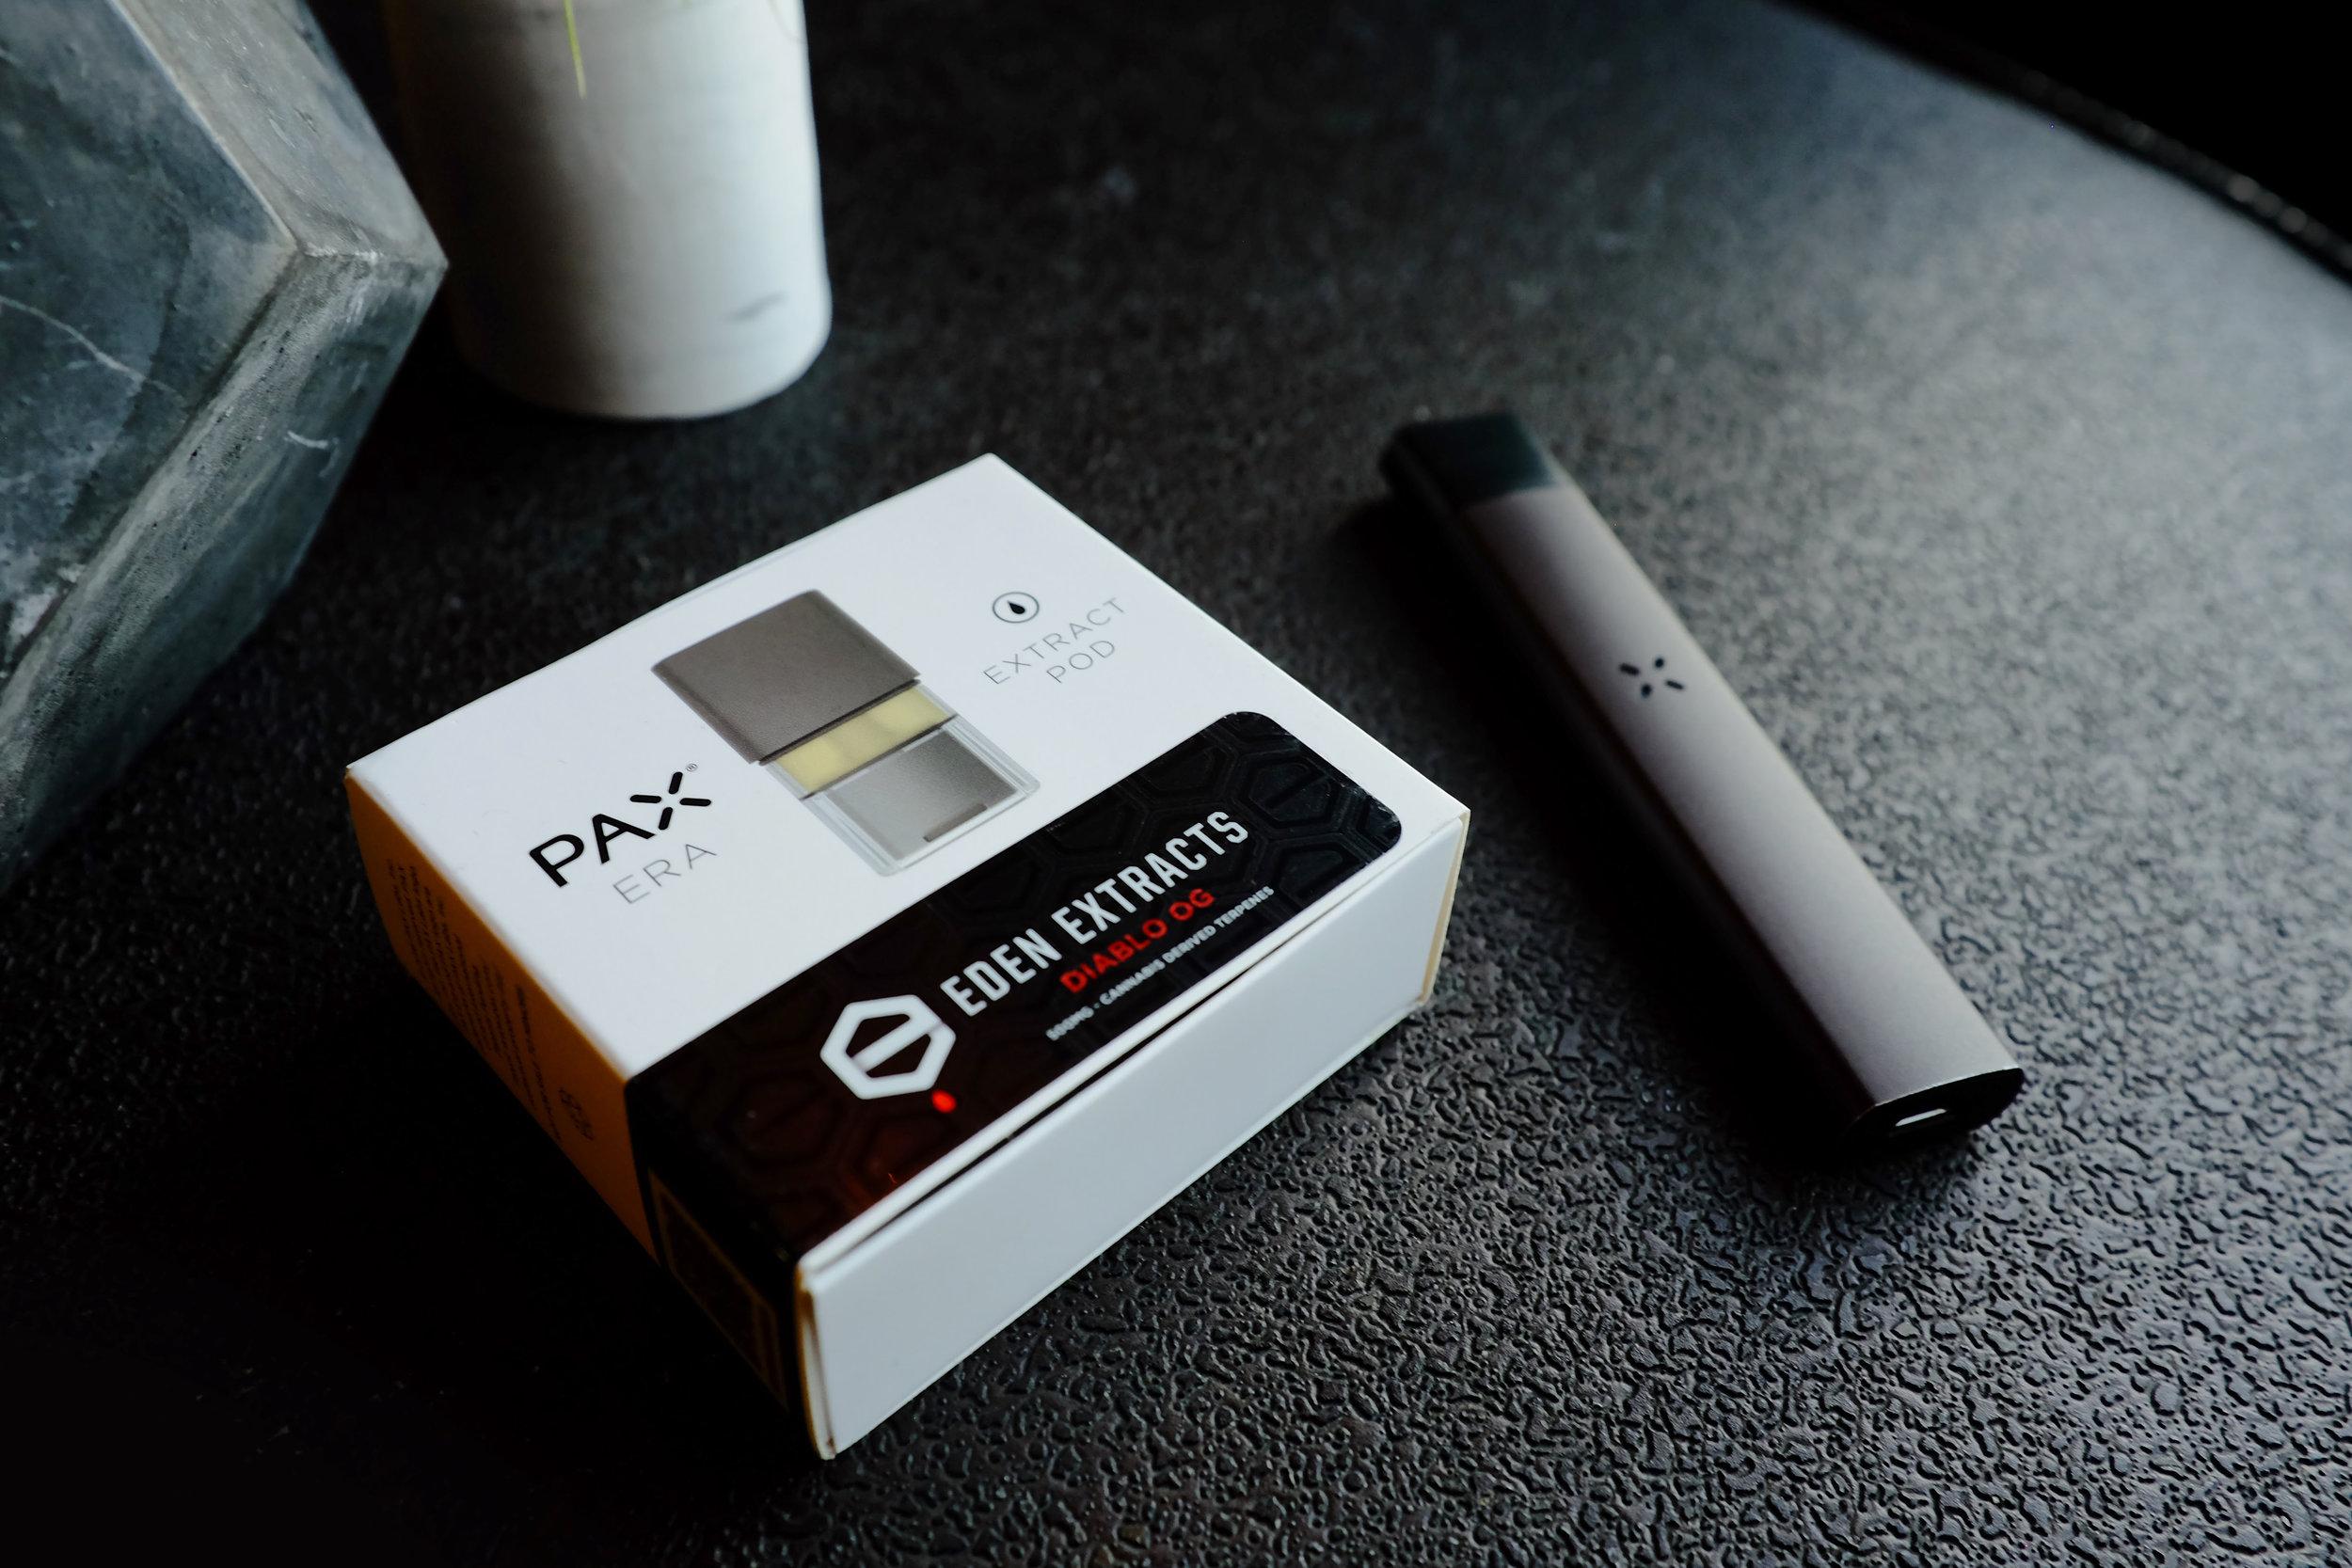 Get Eden Extracts: PAX Era Pods - prohbtd.com